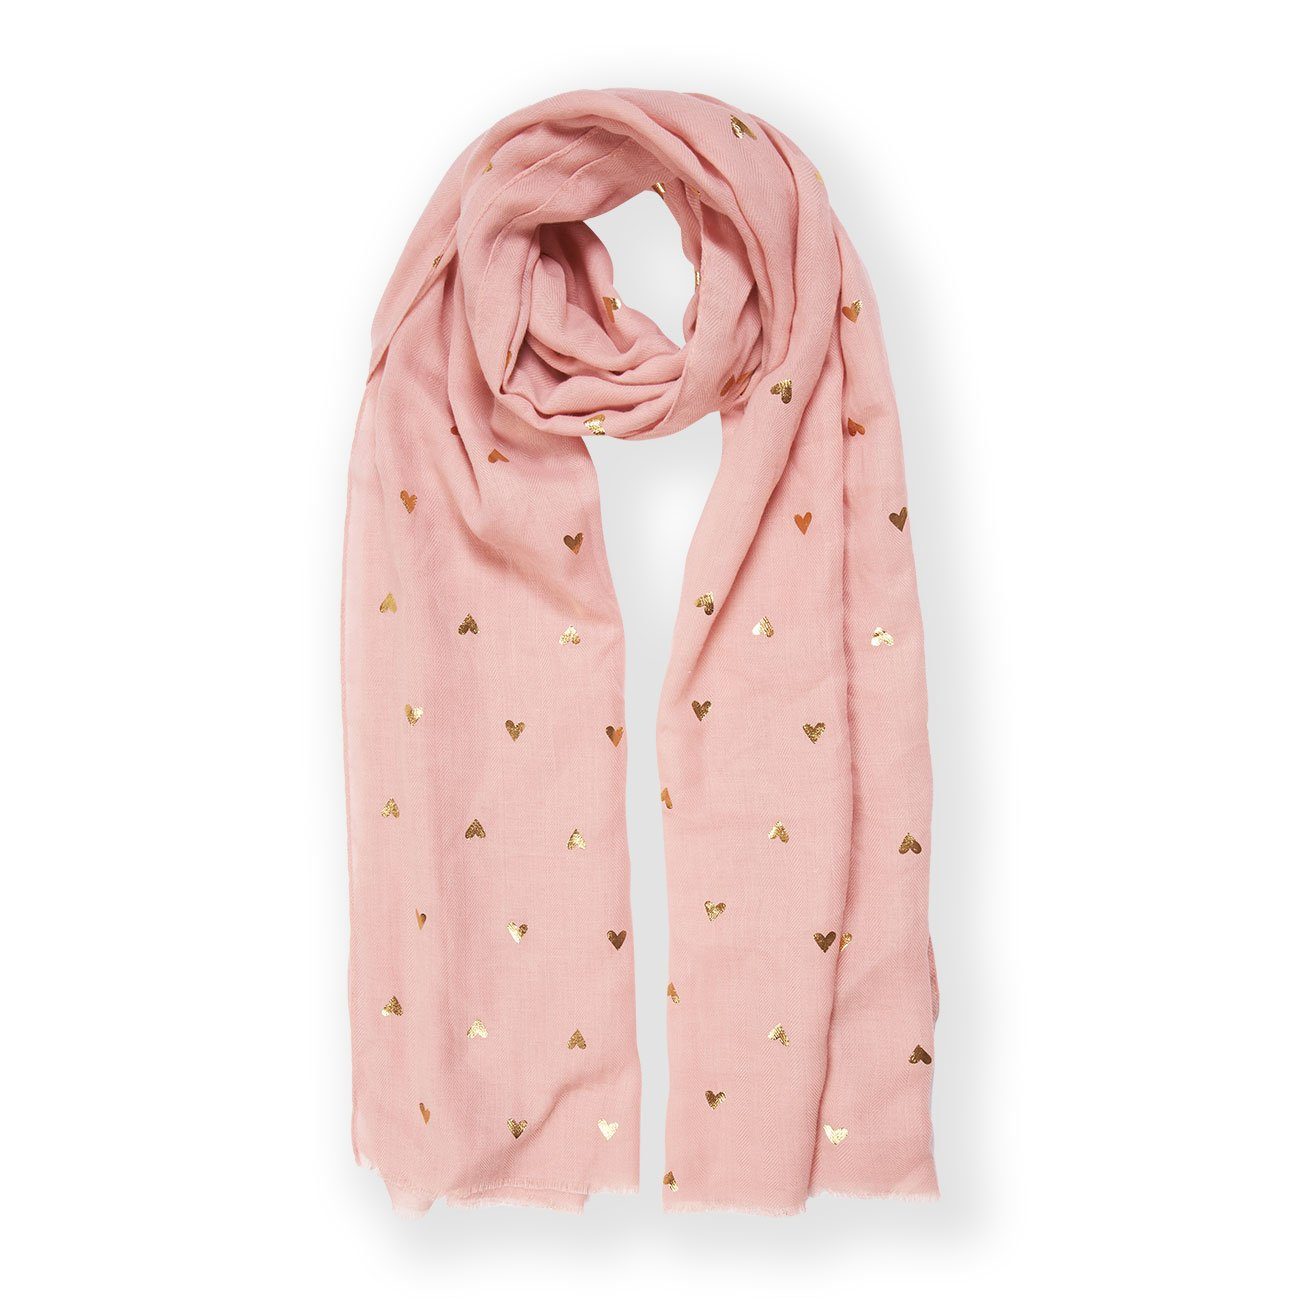 Heart Print Scarf - Pink